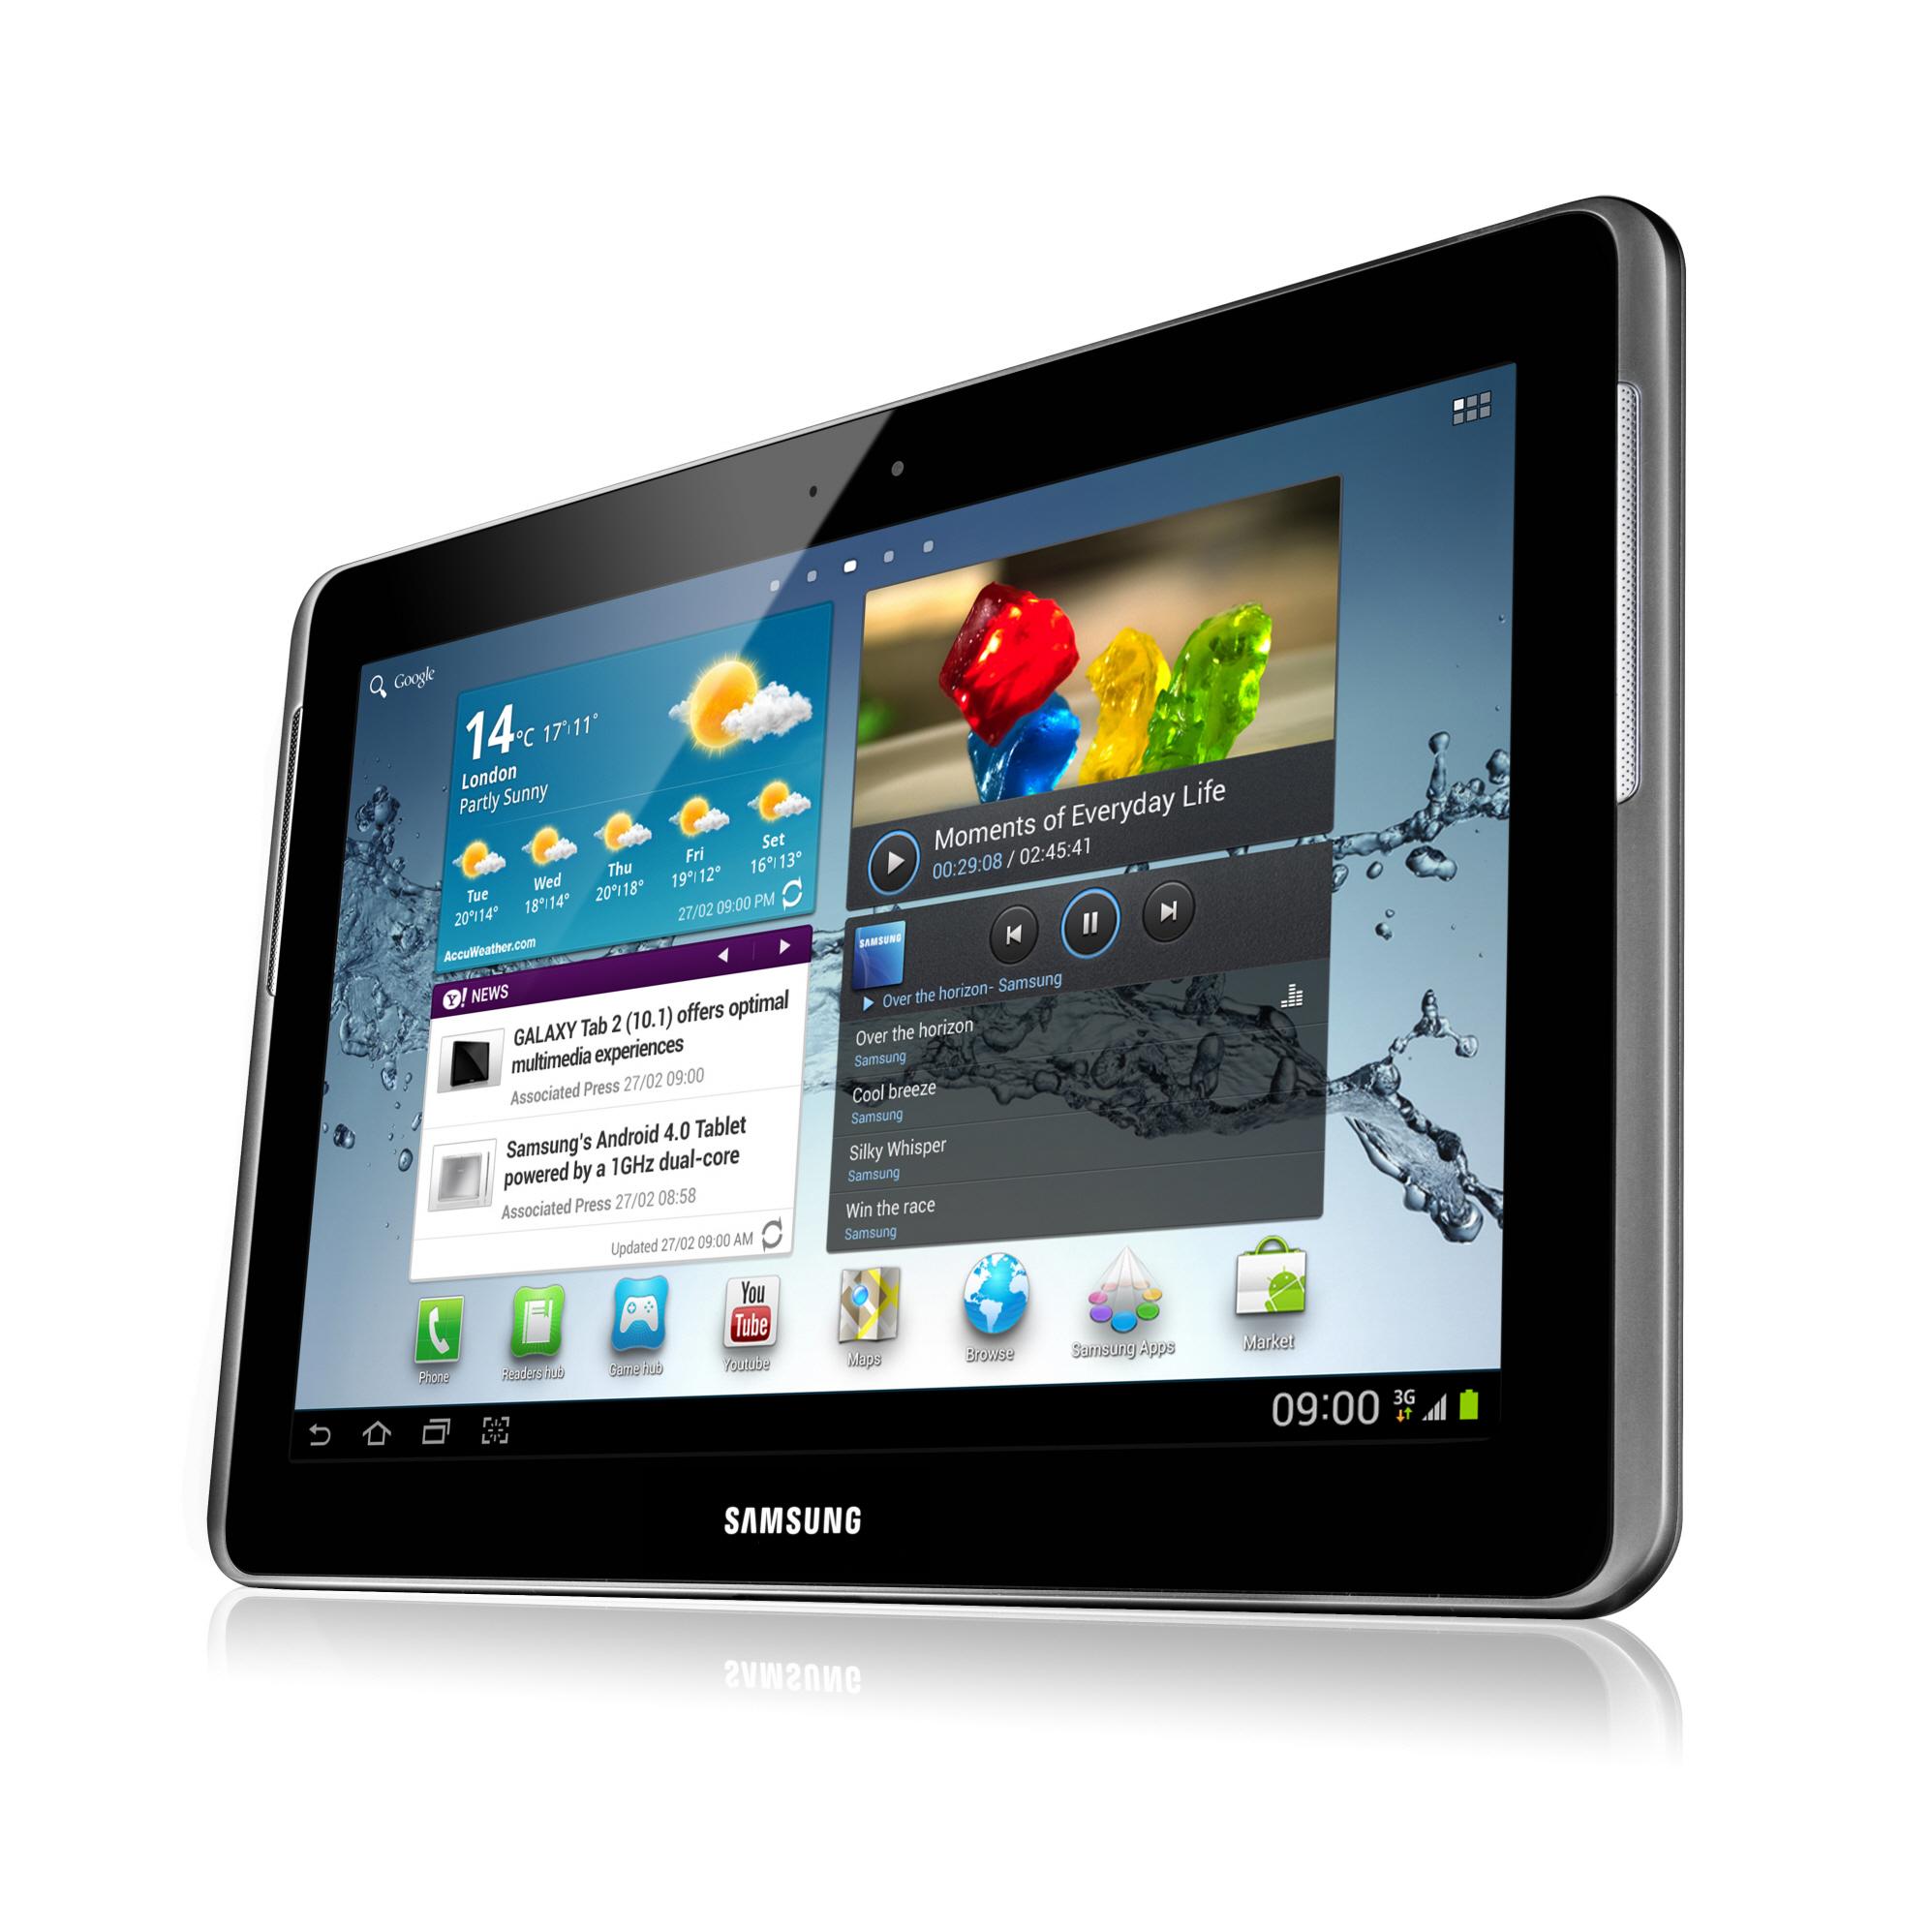 Samsung Galaxy Tab 2 (10.1): 10-Zoll-Tablet mit Android 4.0 für 500 Euro - Galaxy Tab 2 (10.1)